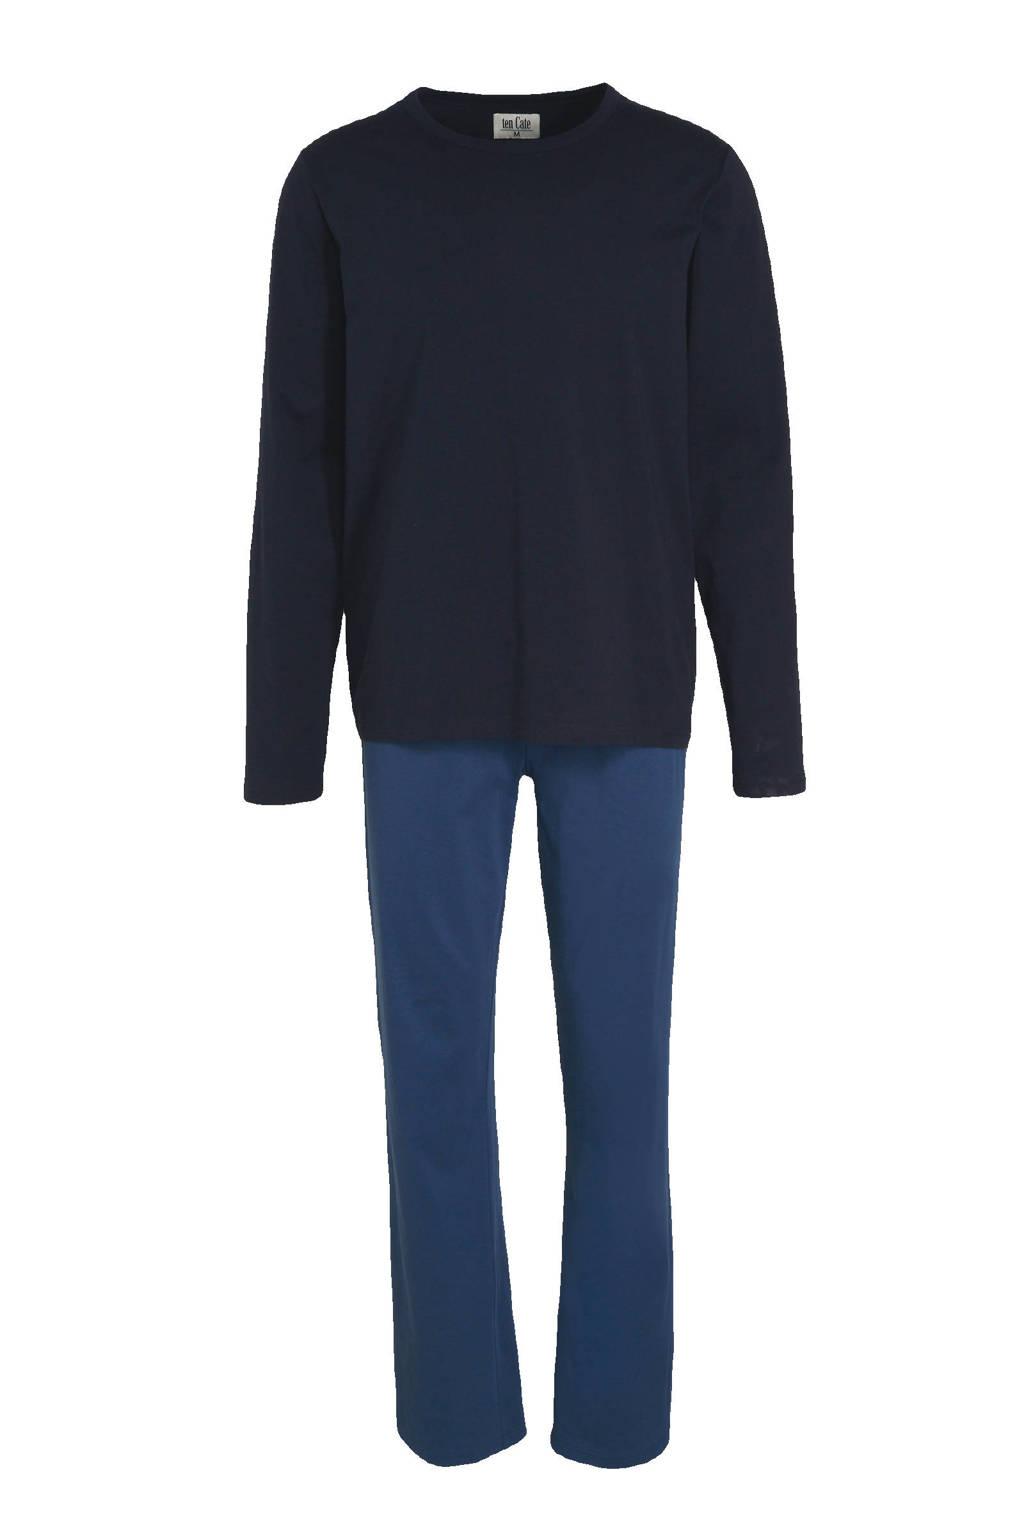 ten Cate pyjama blauw, Blauw